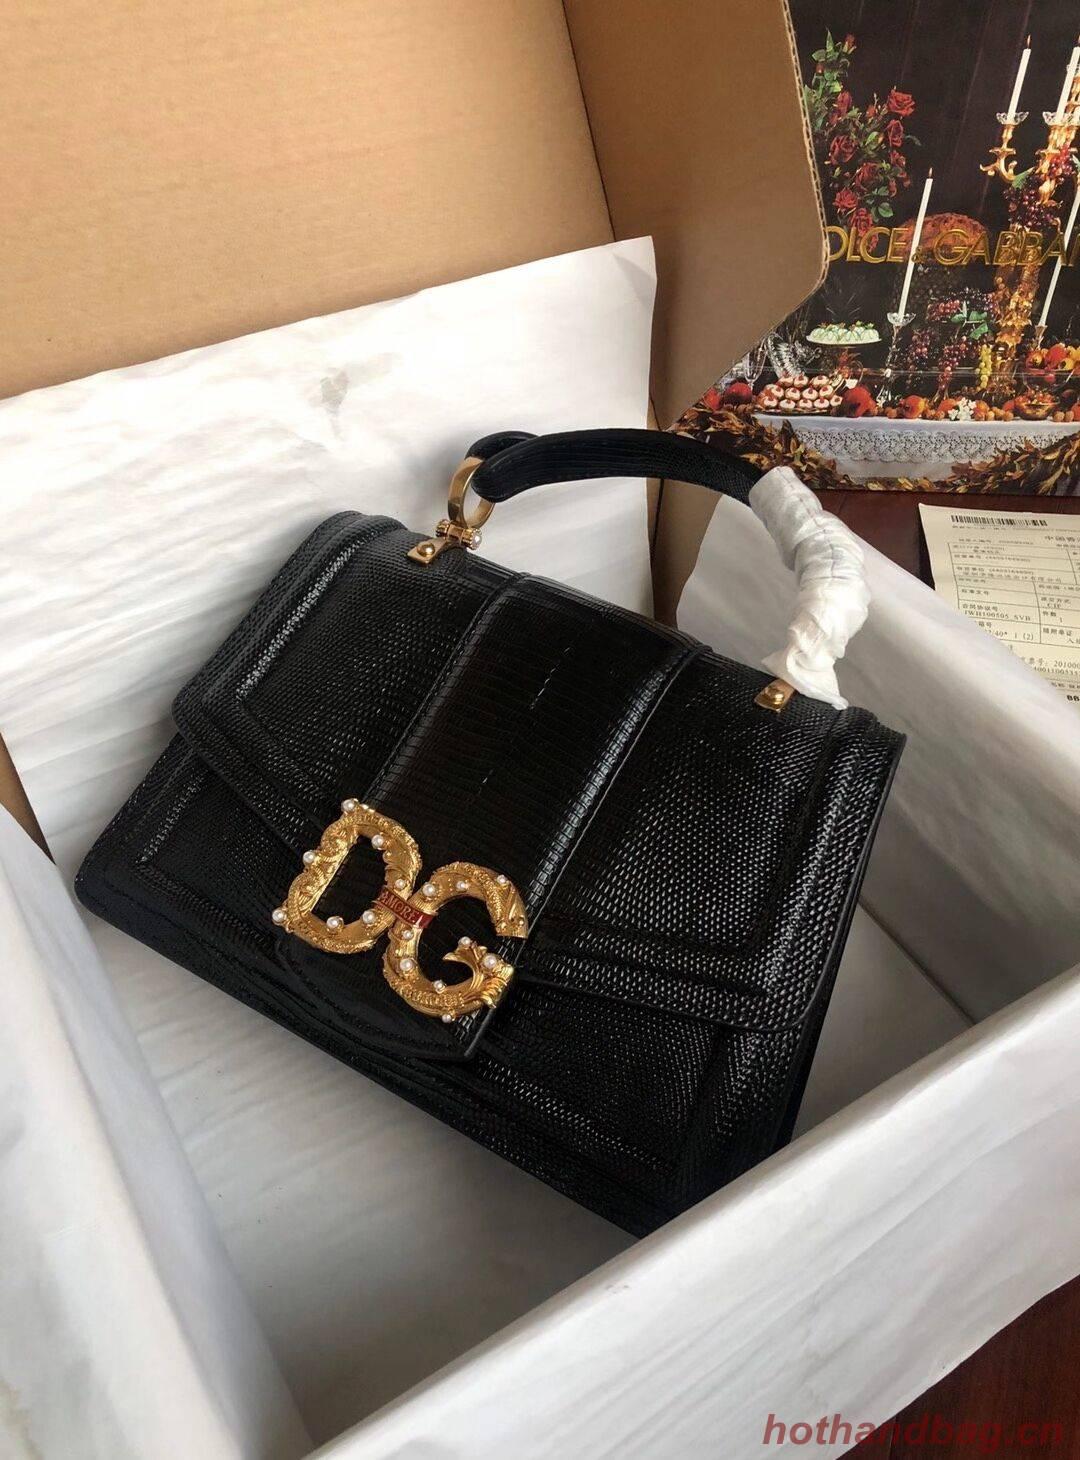 Dolce & Gabbana Origianl Lizard skin Leather Bag 4916F Black